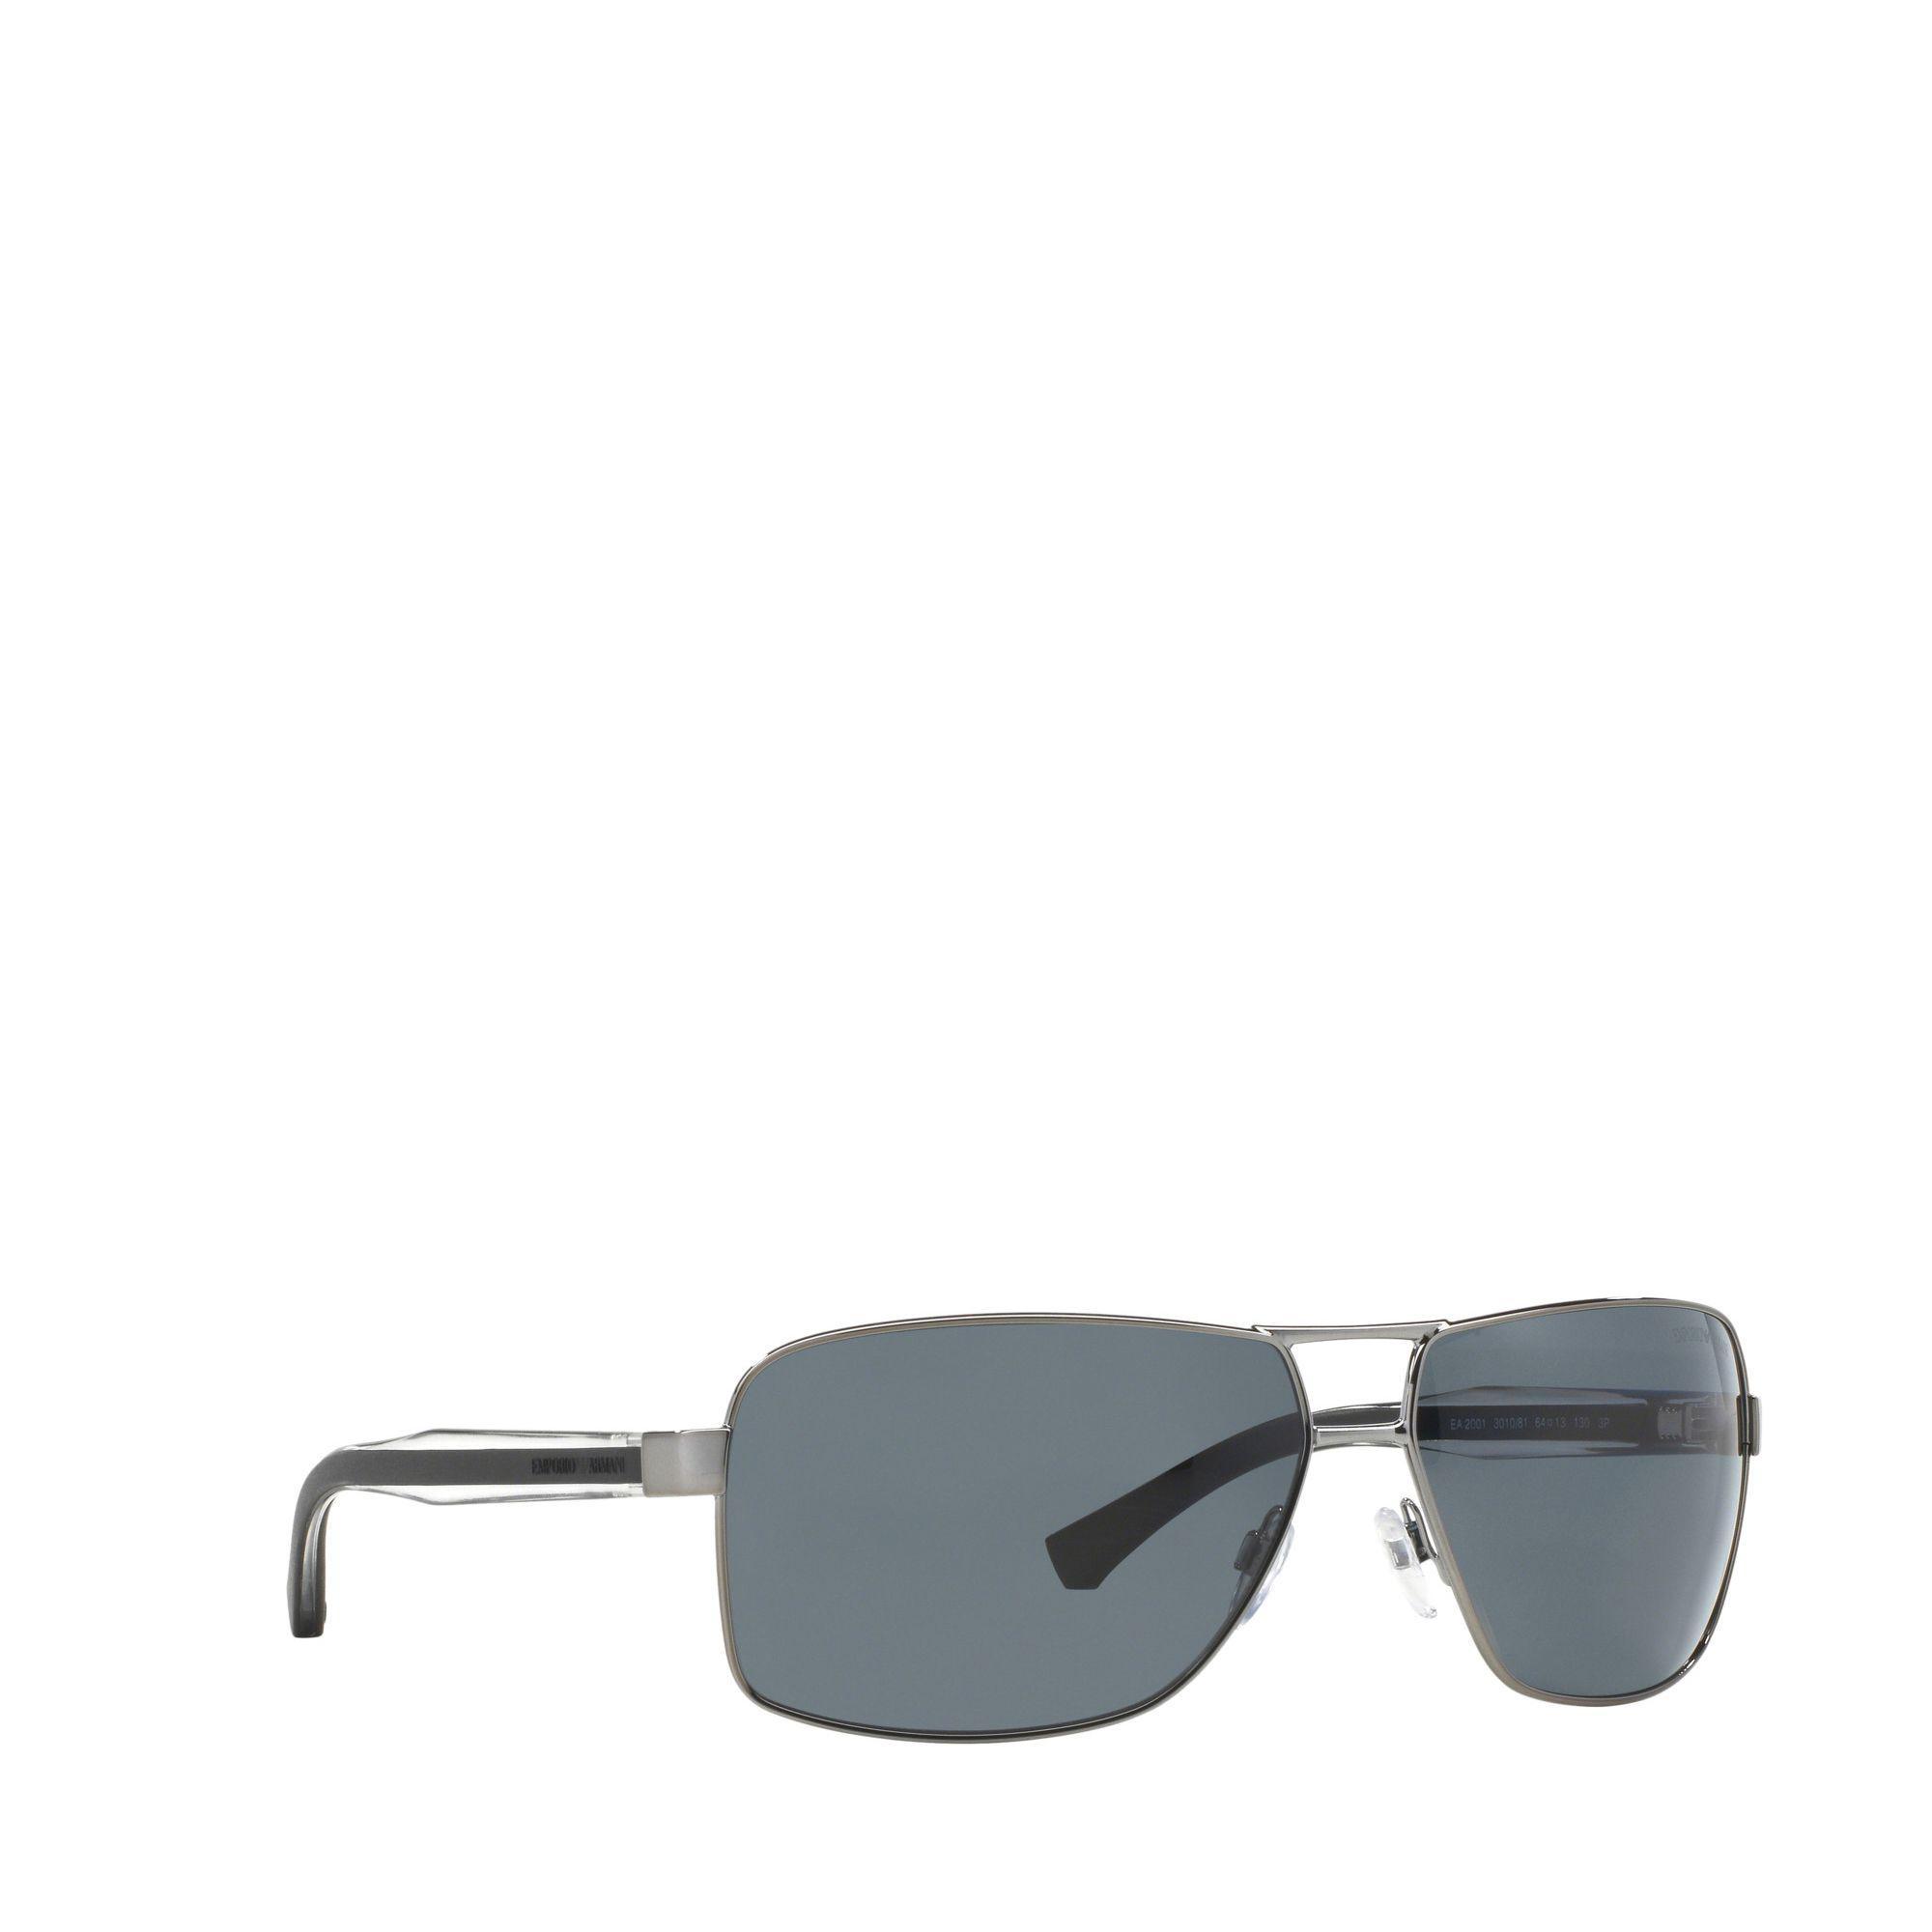 277a3deca895 Emporio Armani Grey Ea2001 Rectangle Sunglasses in Pink for Men - Lyst